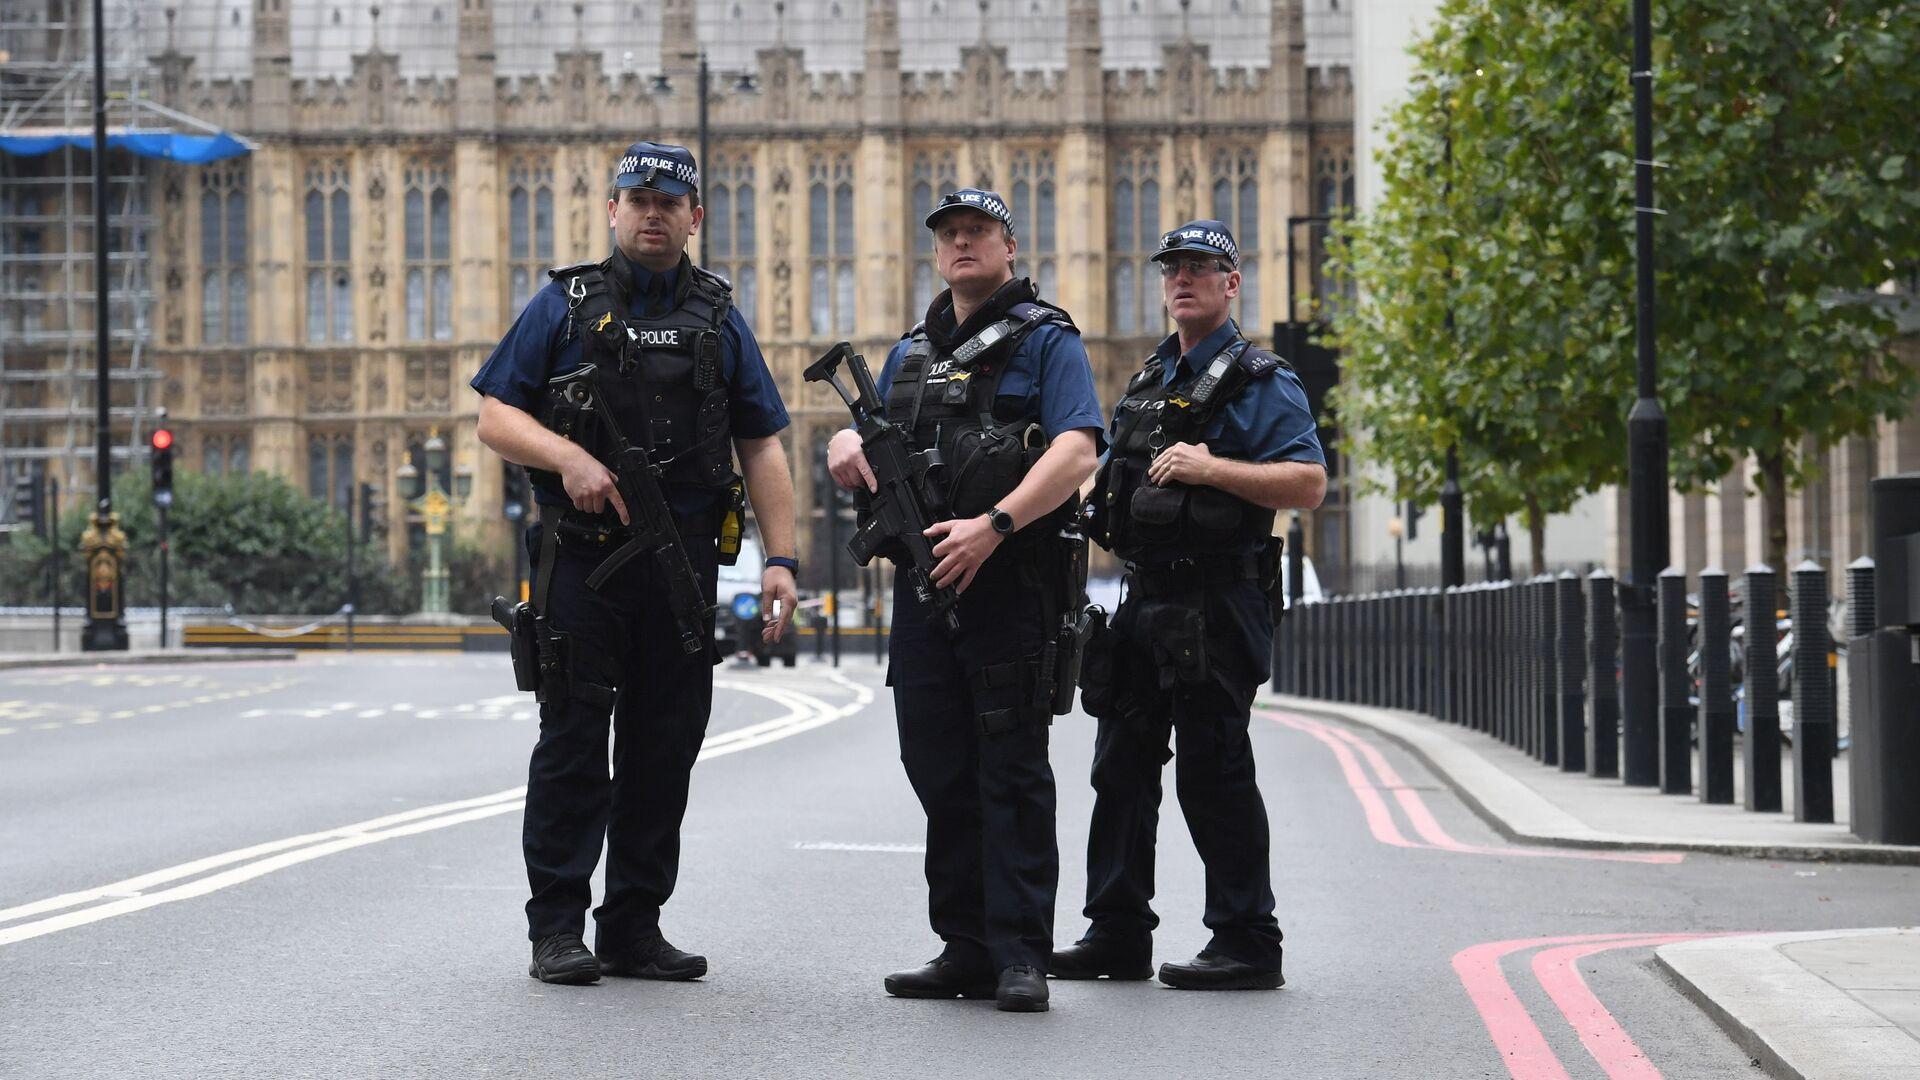 Сотрудники полиции у здания парламента в Лондоне, Великобритания. 14 августа 2018 - РИА Новости, 1920, 23.09.2020